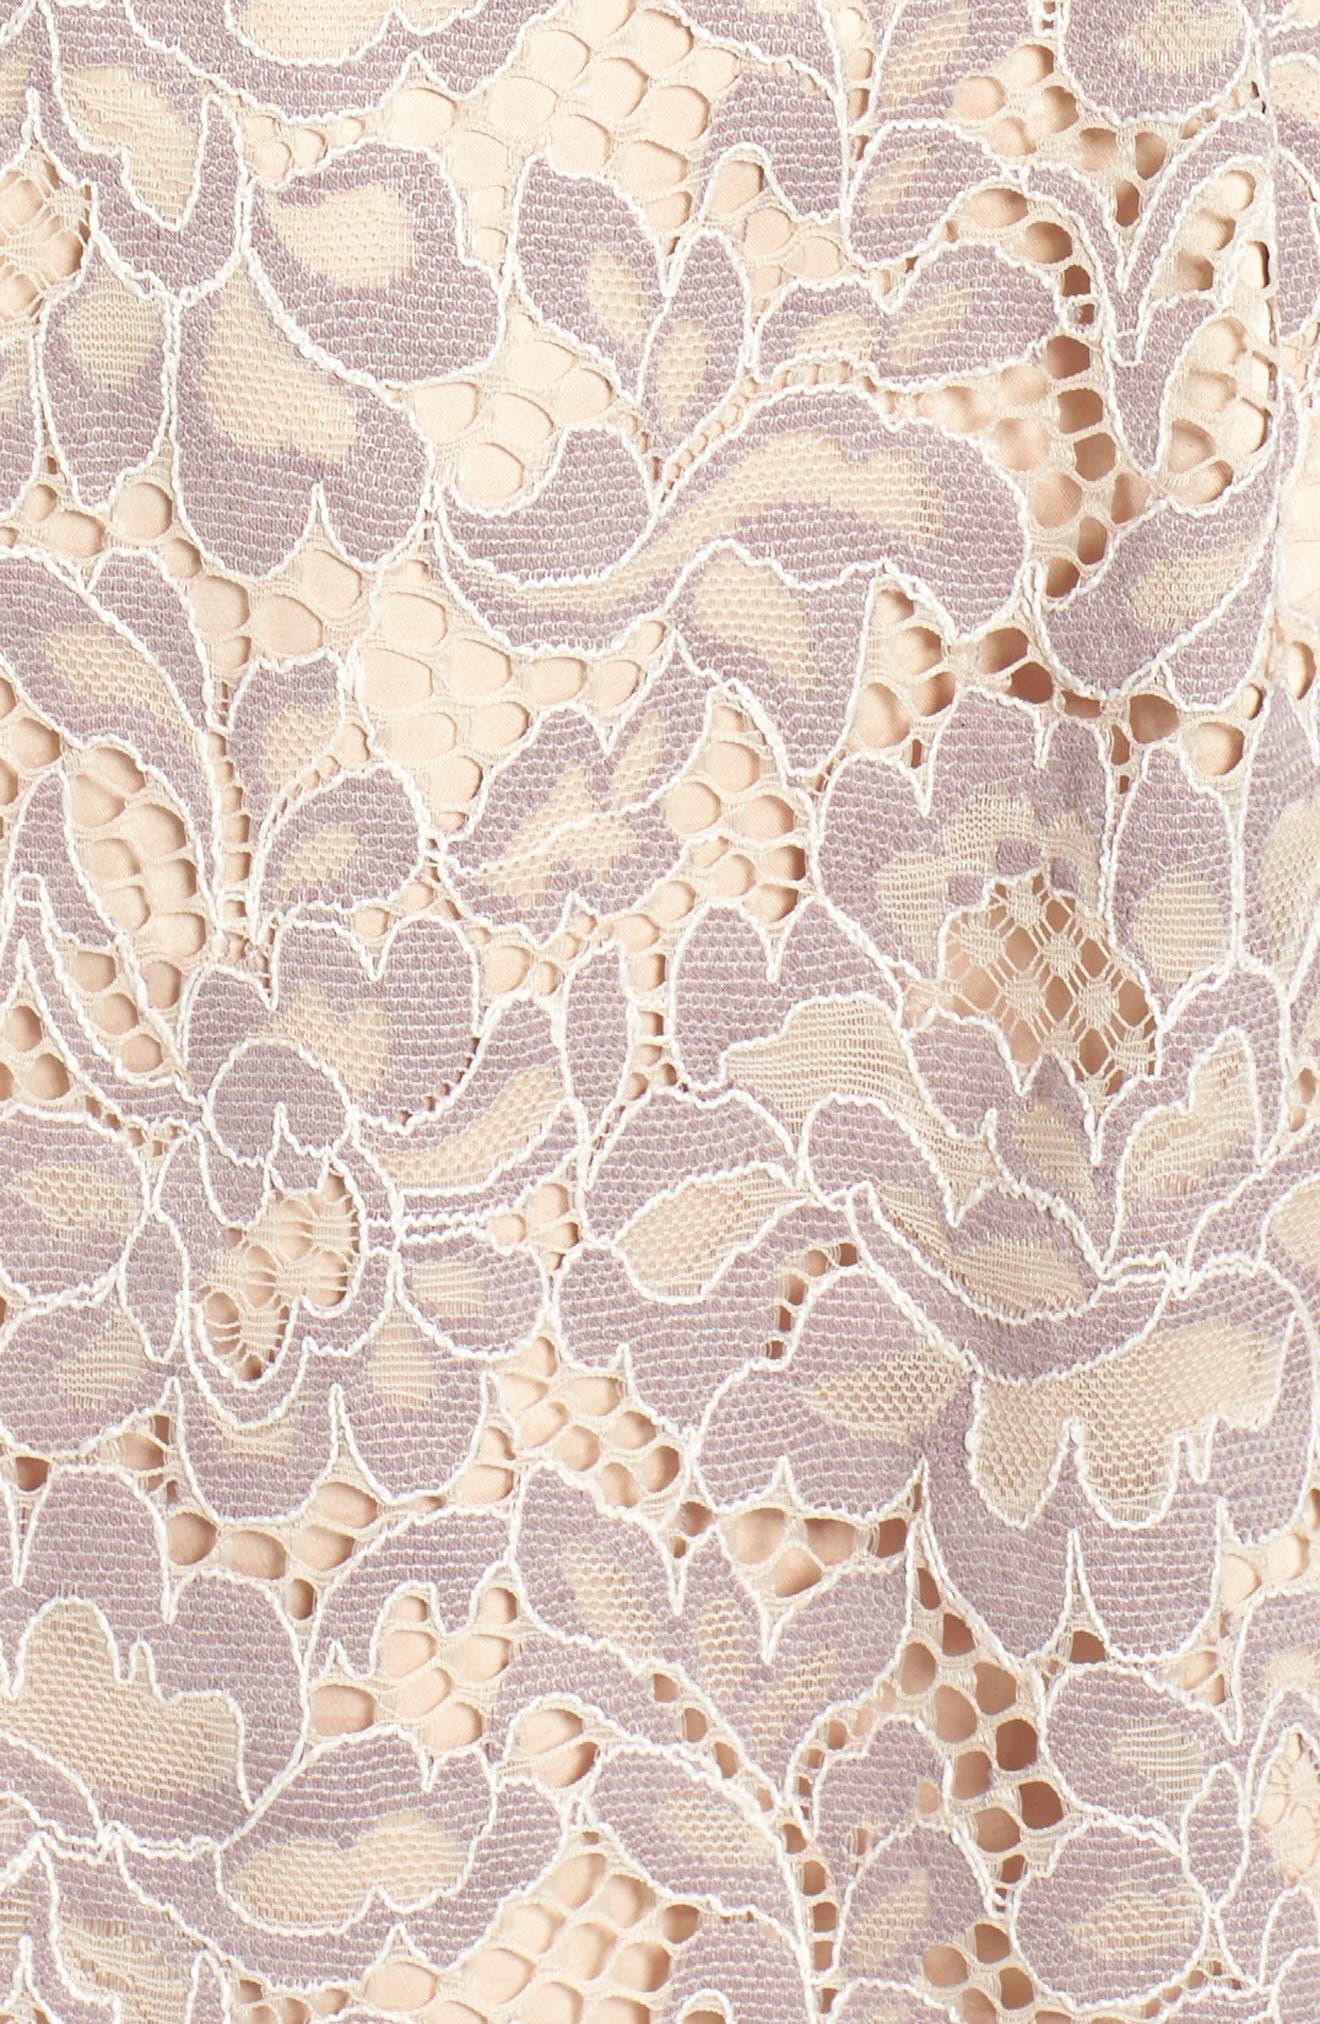 Lace Fit & Flare Dress,                             Alternate thumbnail 7, color,                             030